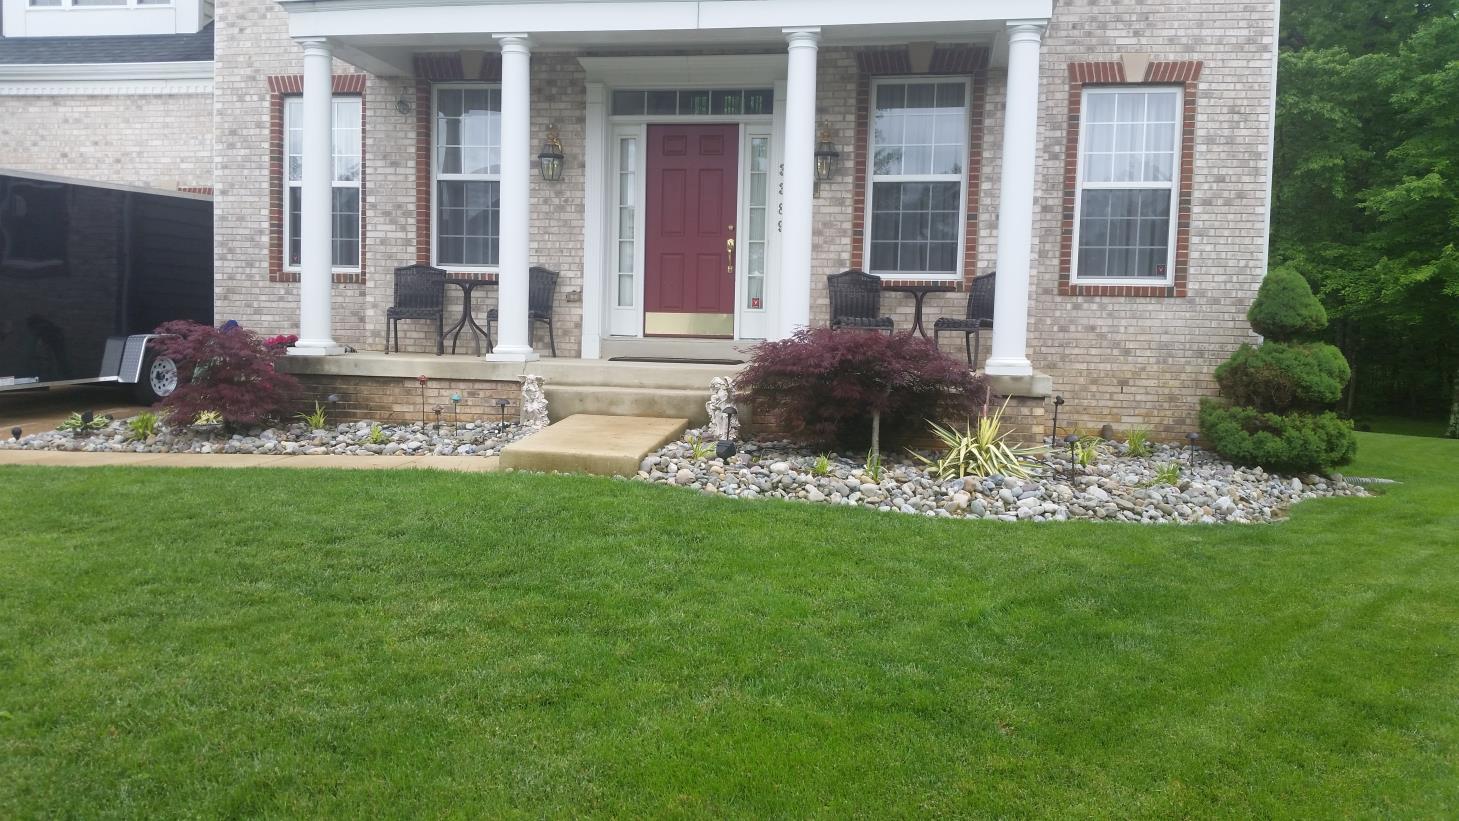 Kd lawn service llc white plains maryland for Local garden maintenance